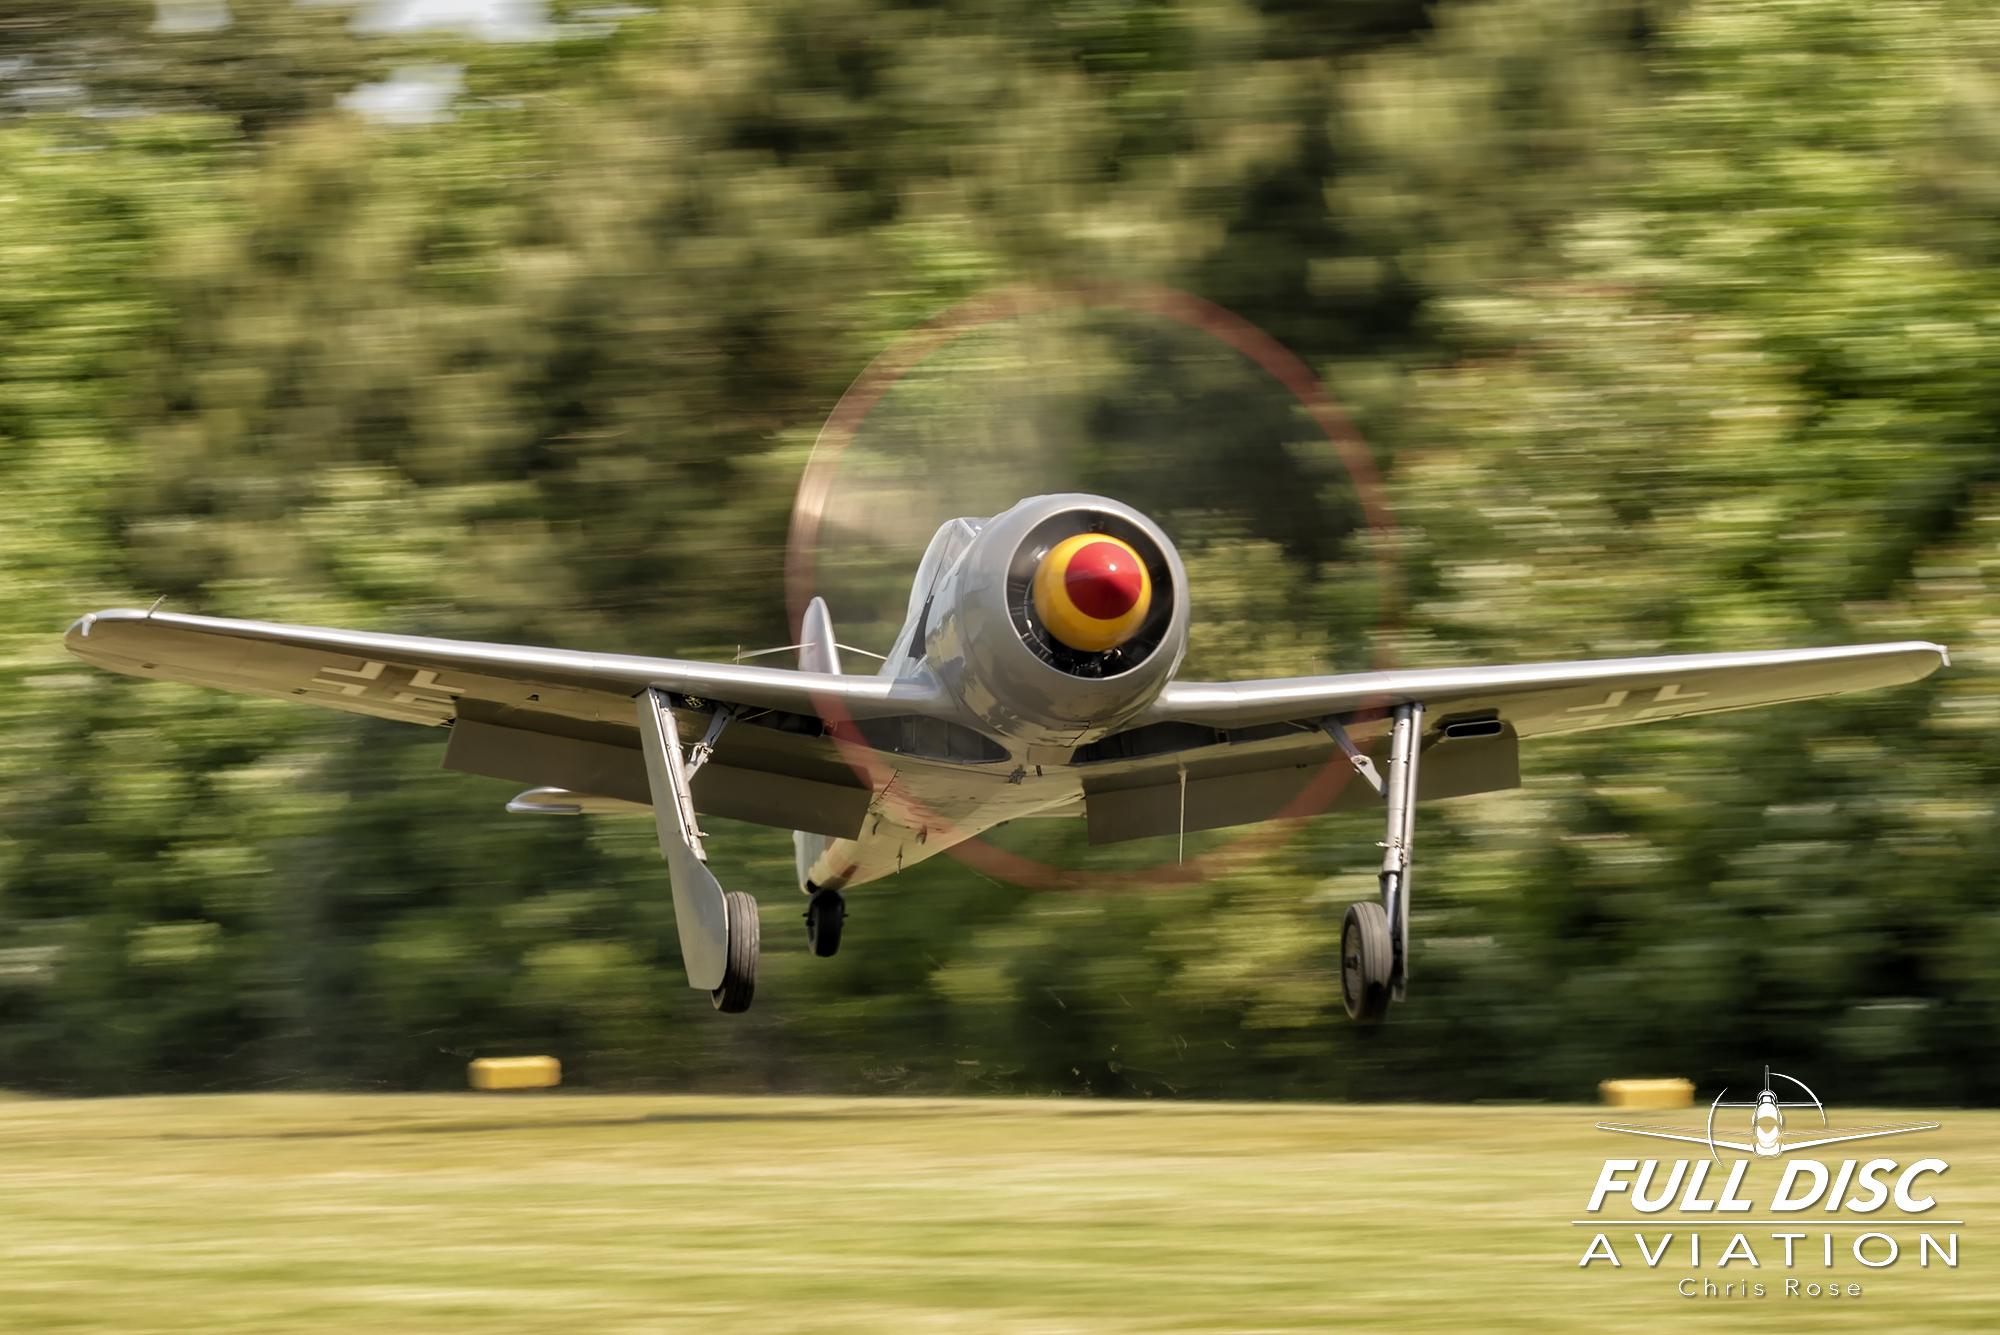 warbirdsoverthebeach_fulldiscaviation_chrisrose_fw190.jpg